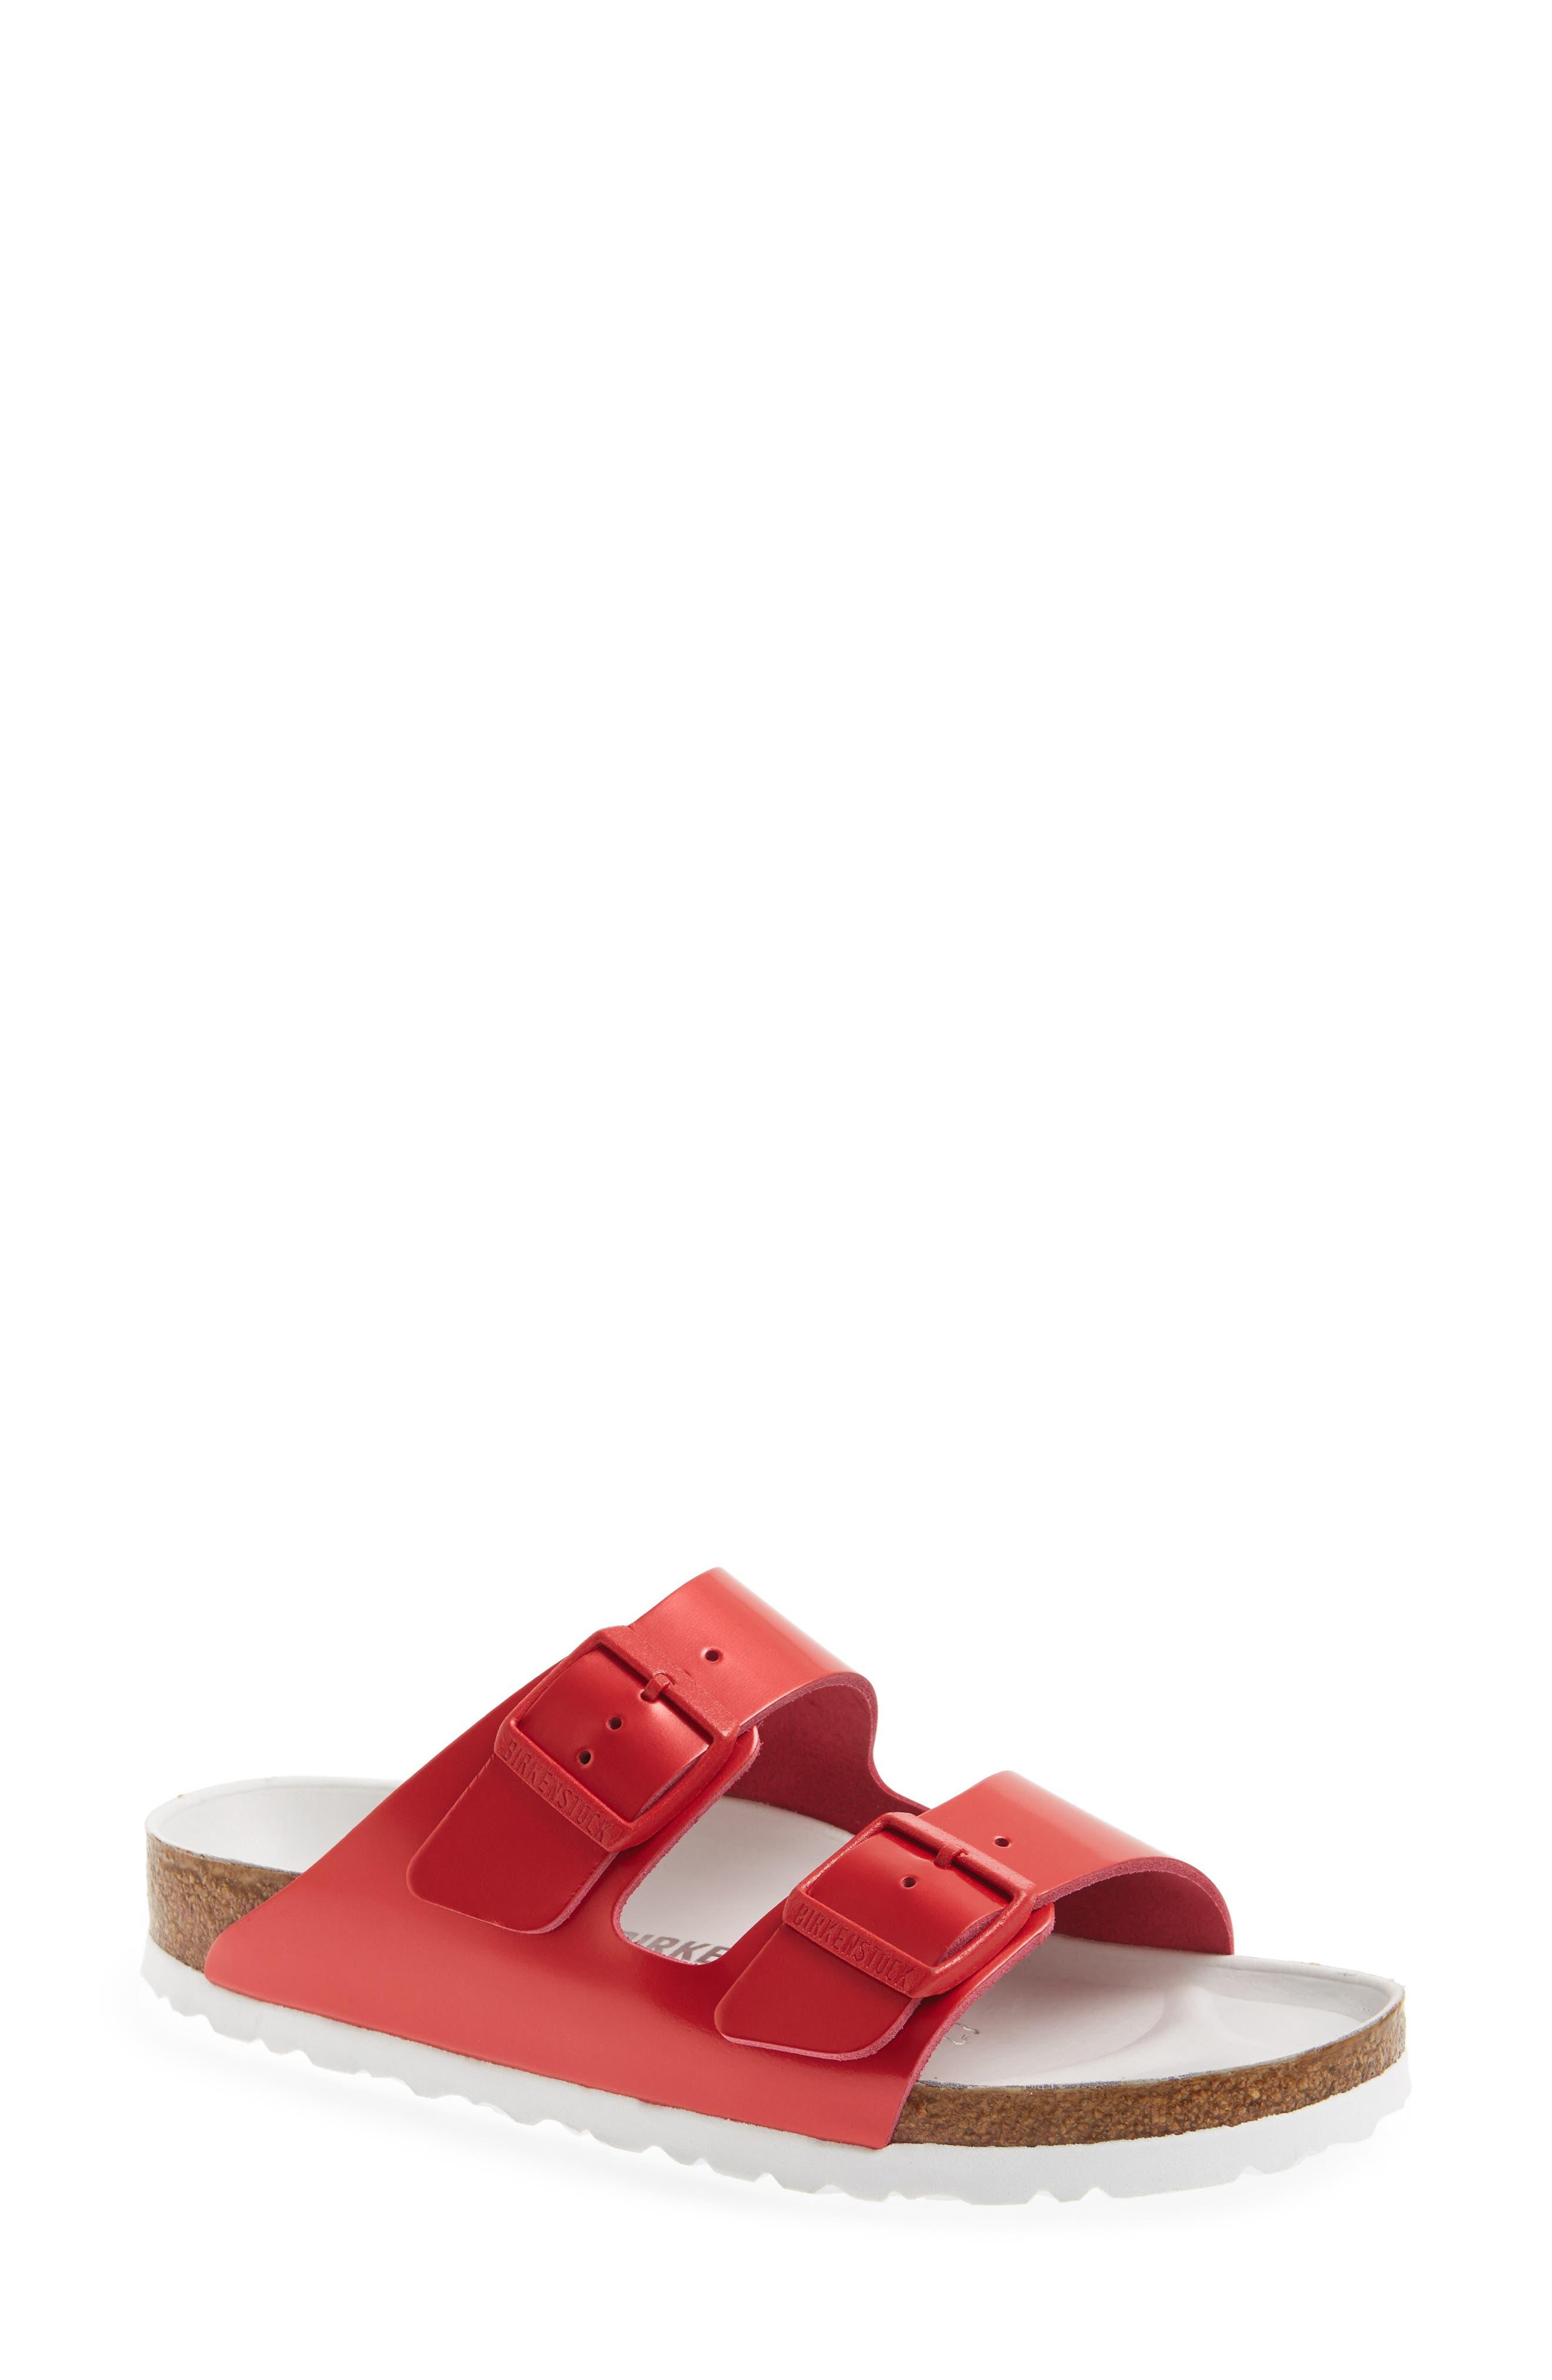 Alternate Image 1 Selected - Birkenstock Arizona Hex Limited Edition - Shock Drop Slide Sandal (Women)